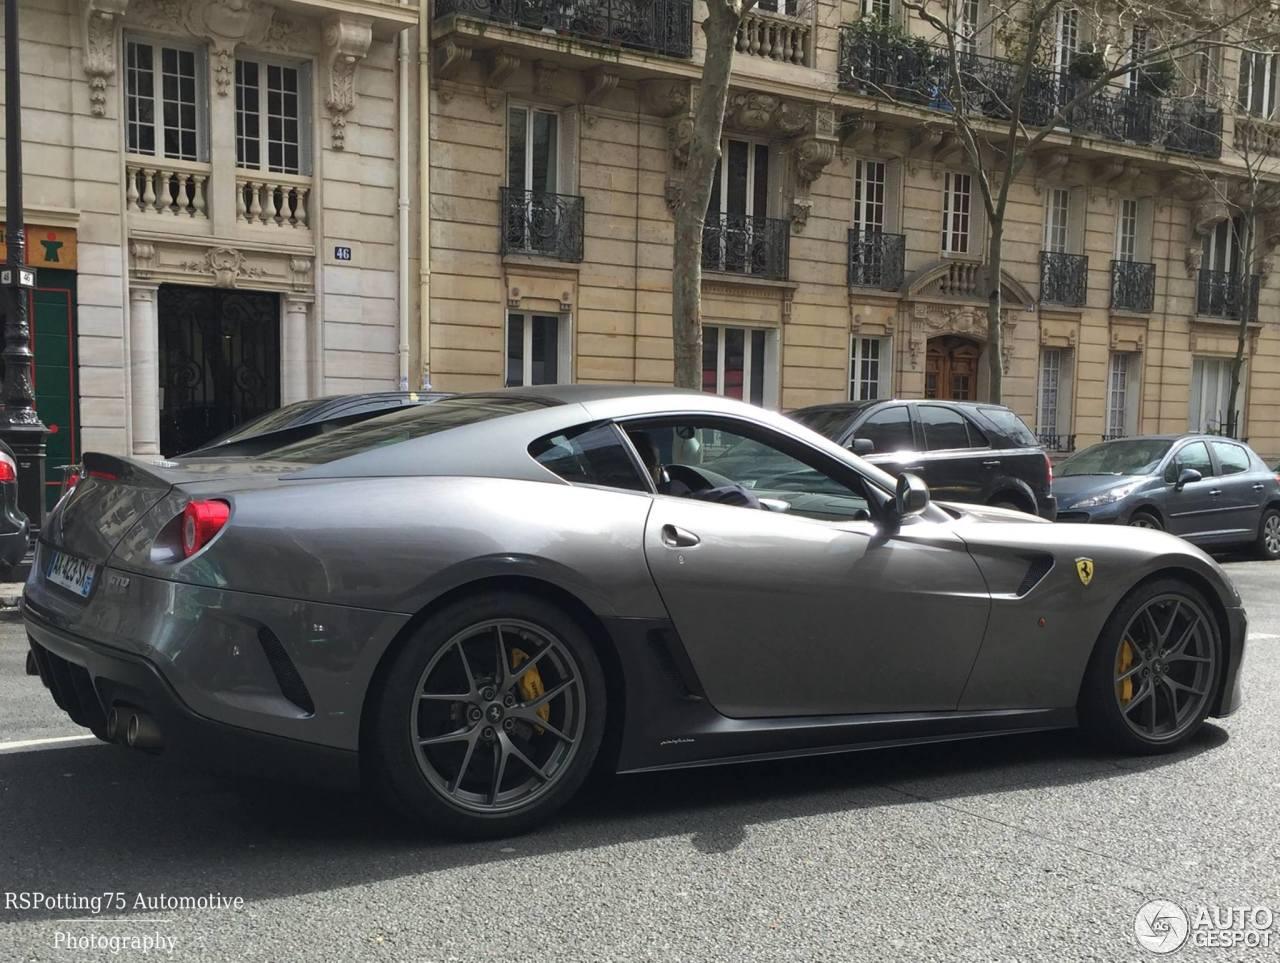 ferrari 599 gto matte black price - Matte Black Ferrari 599